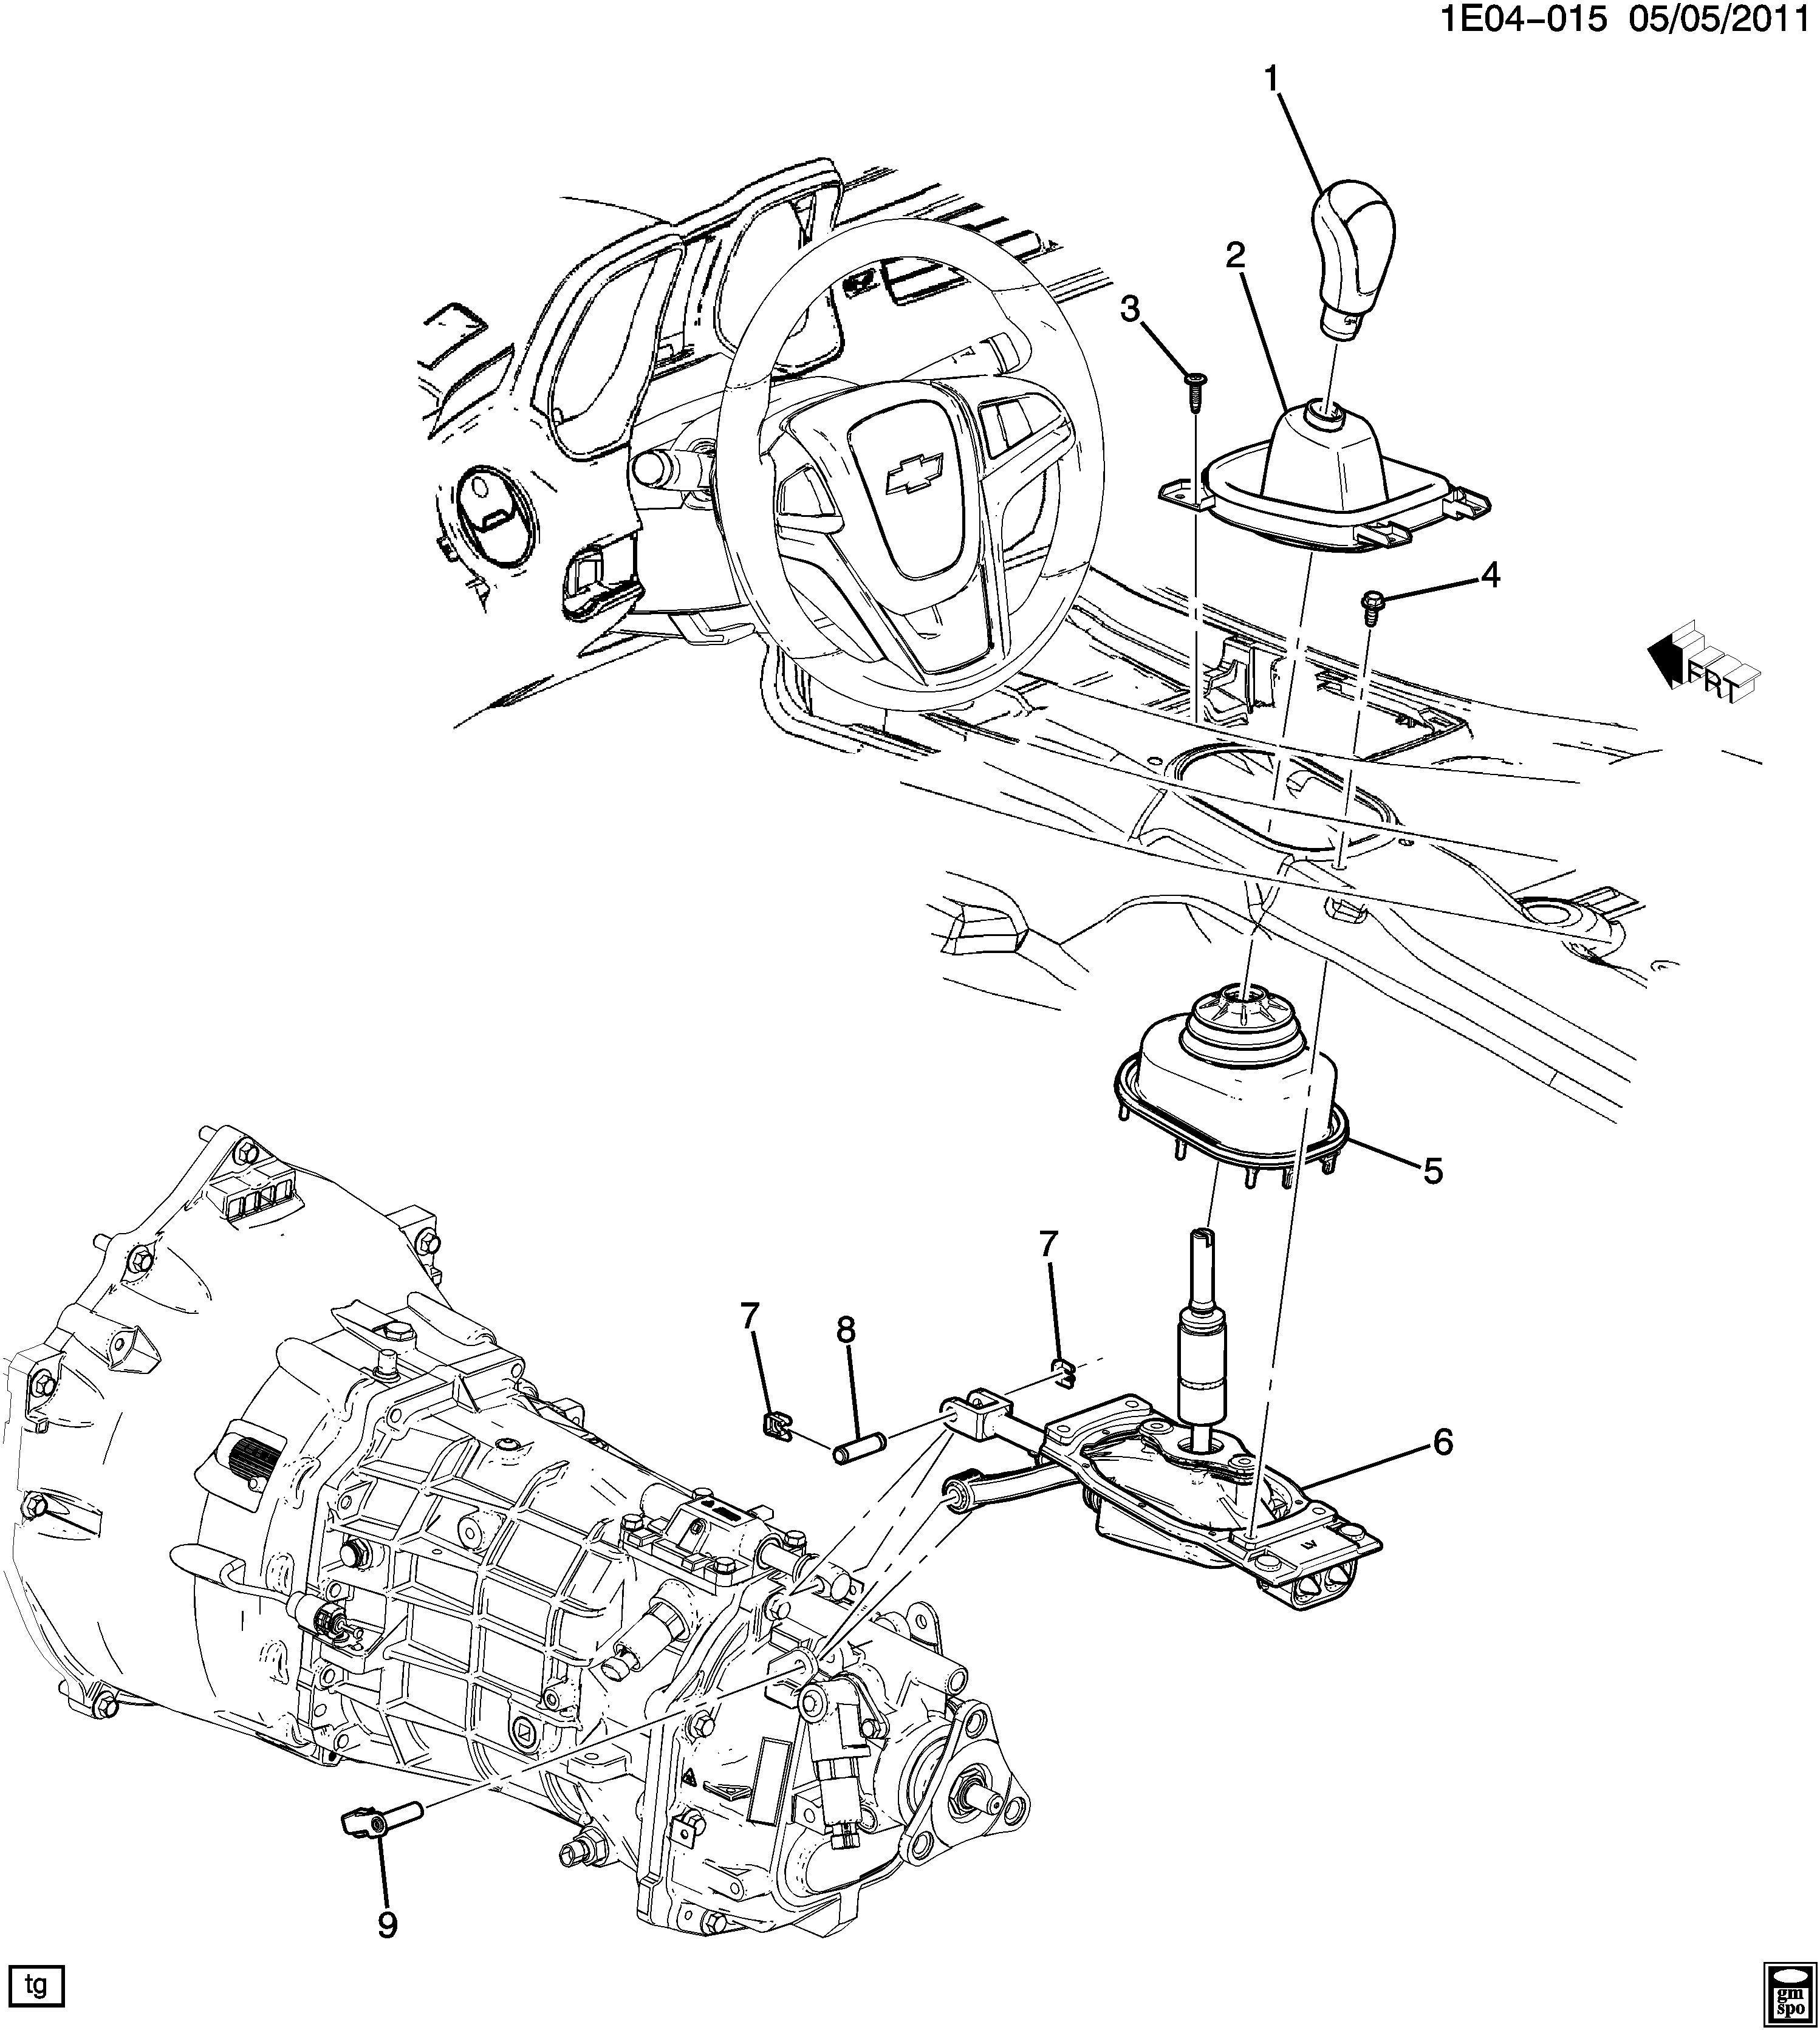 Chevrolet Camaro Ss 2ss 2dr Pin Transmission Shifter